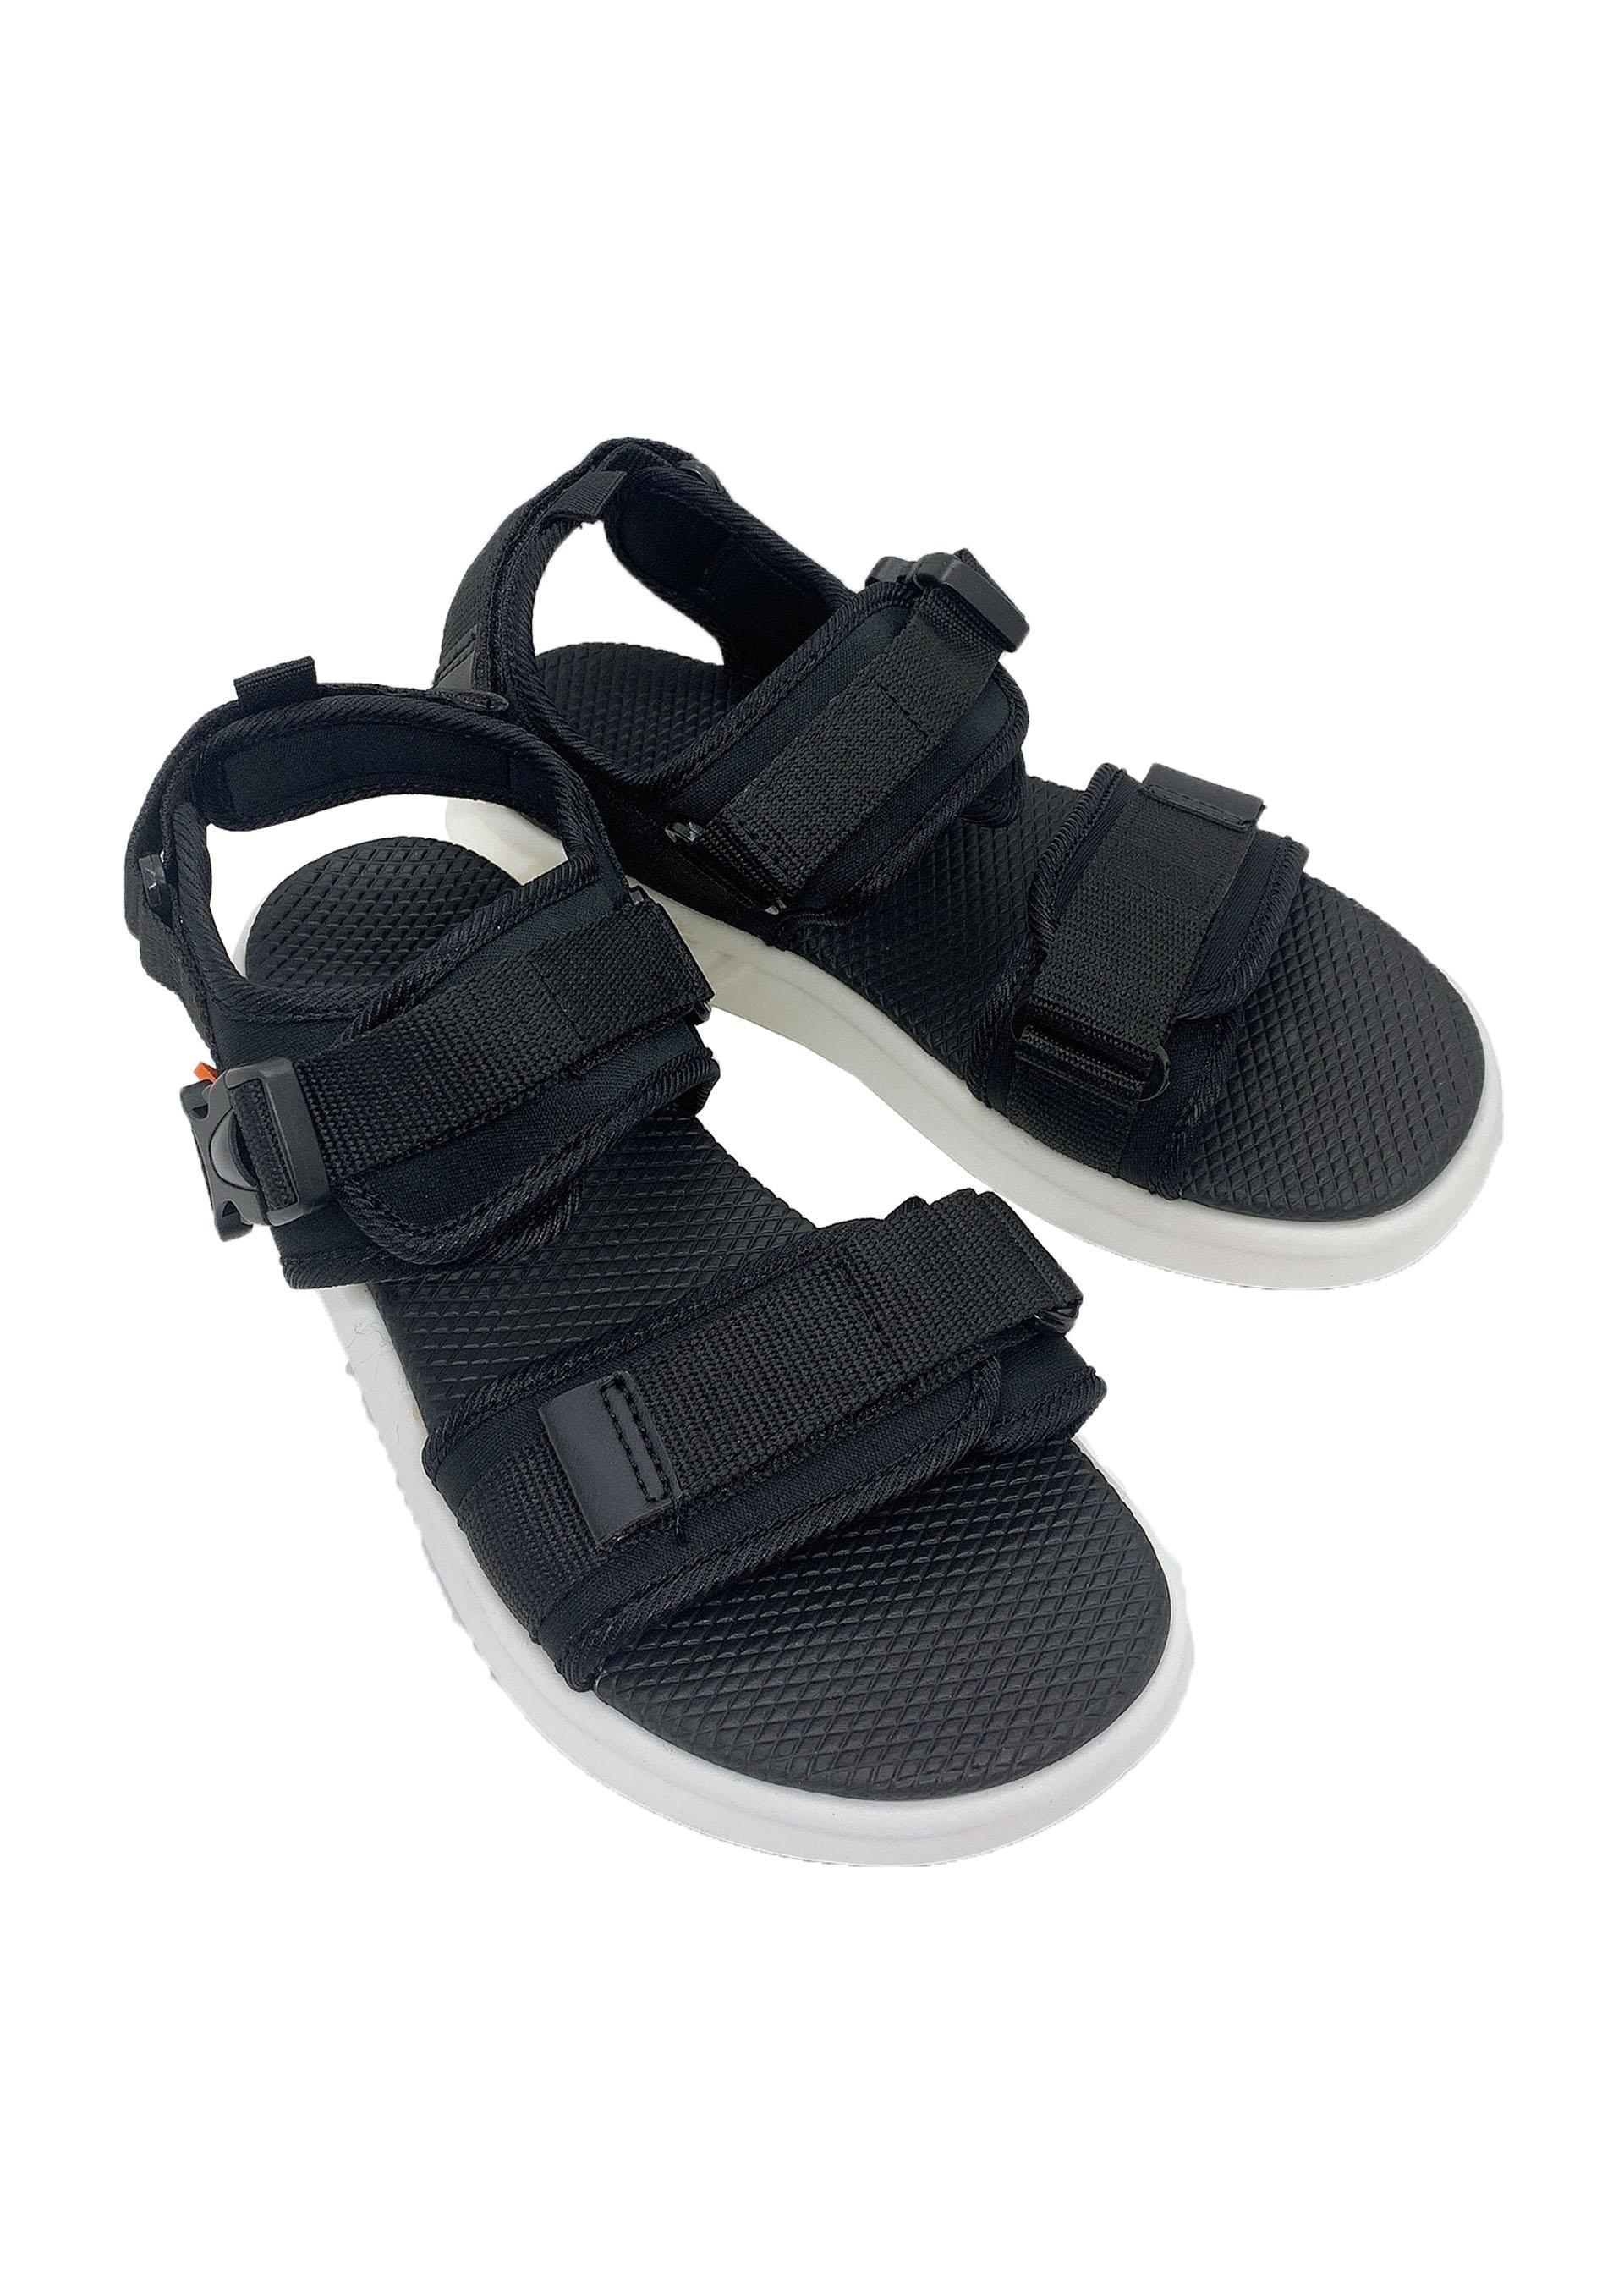 Sandals Unisex SD01